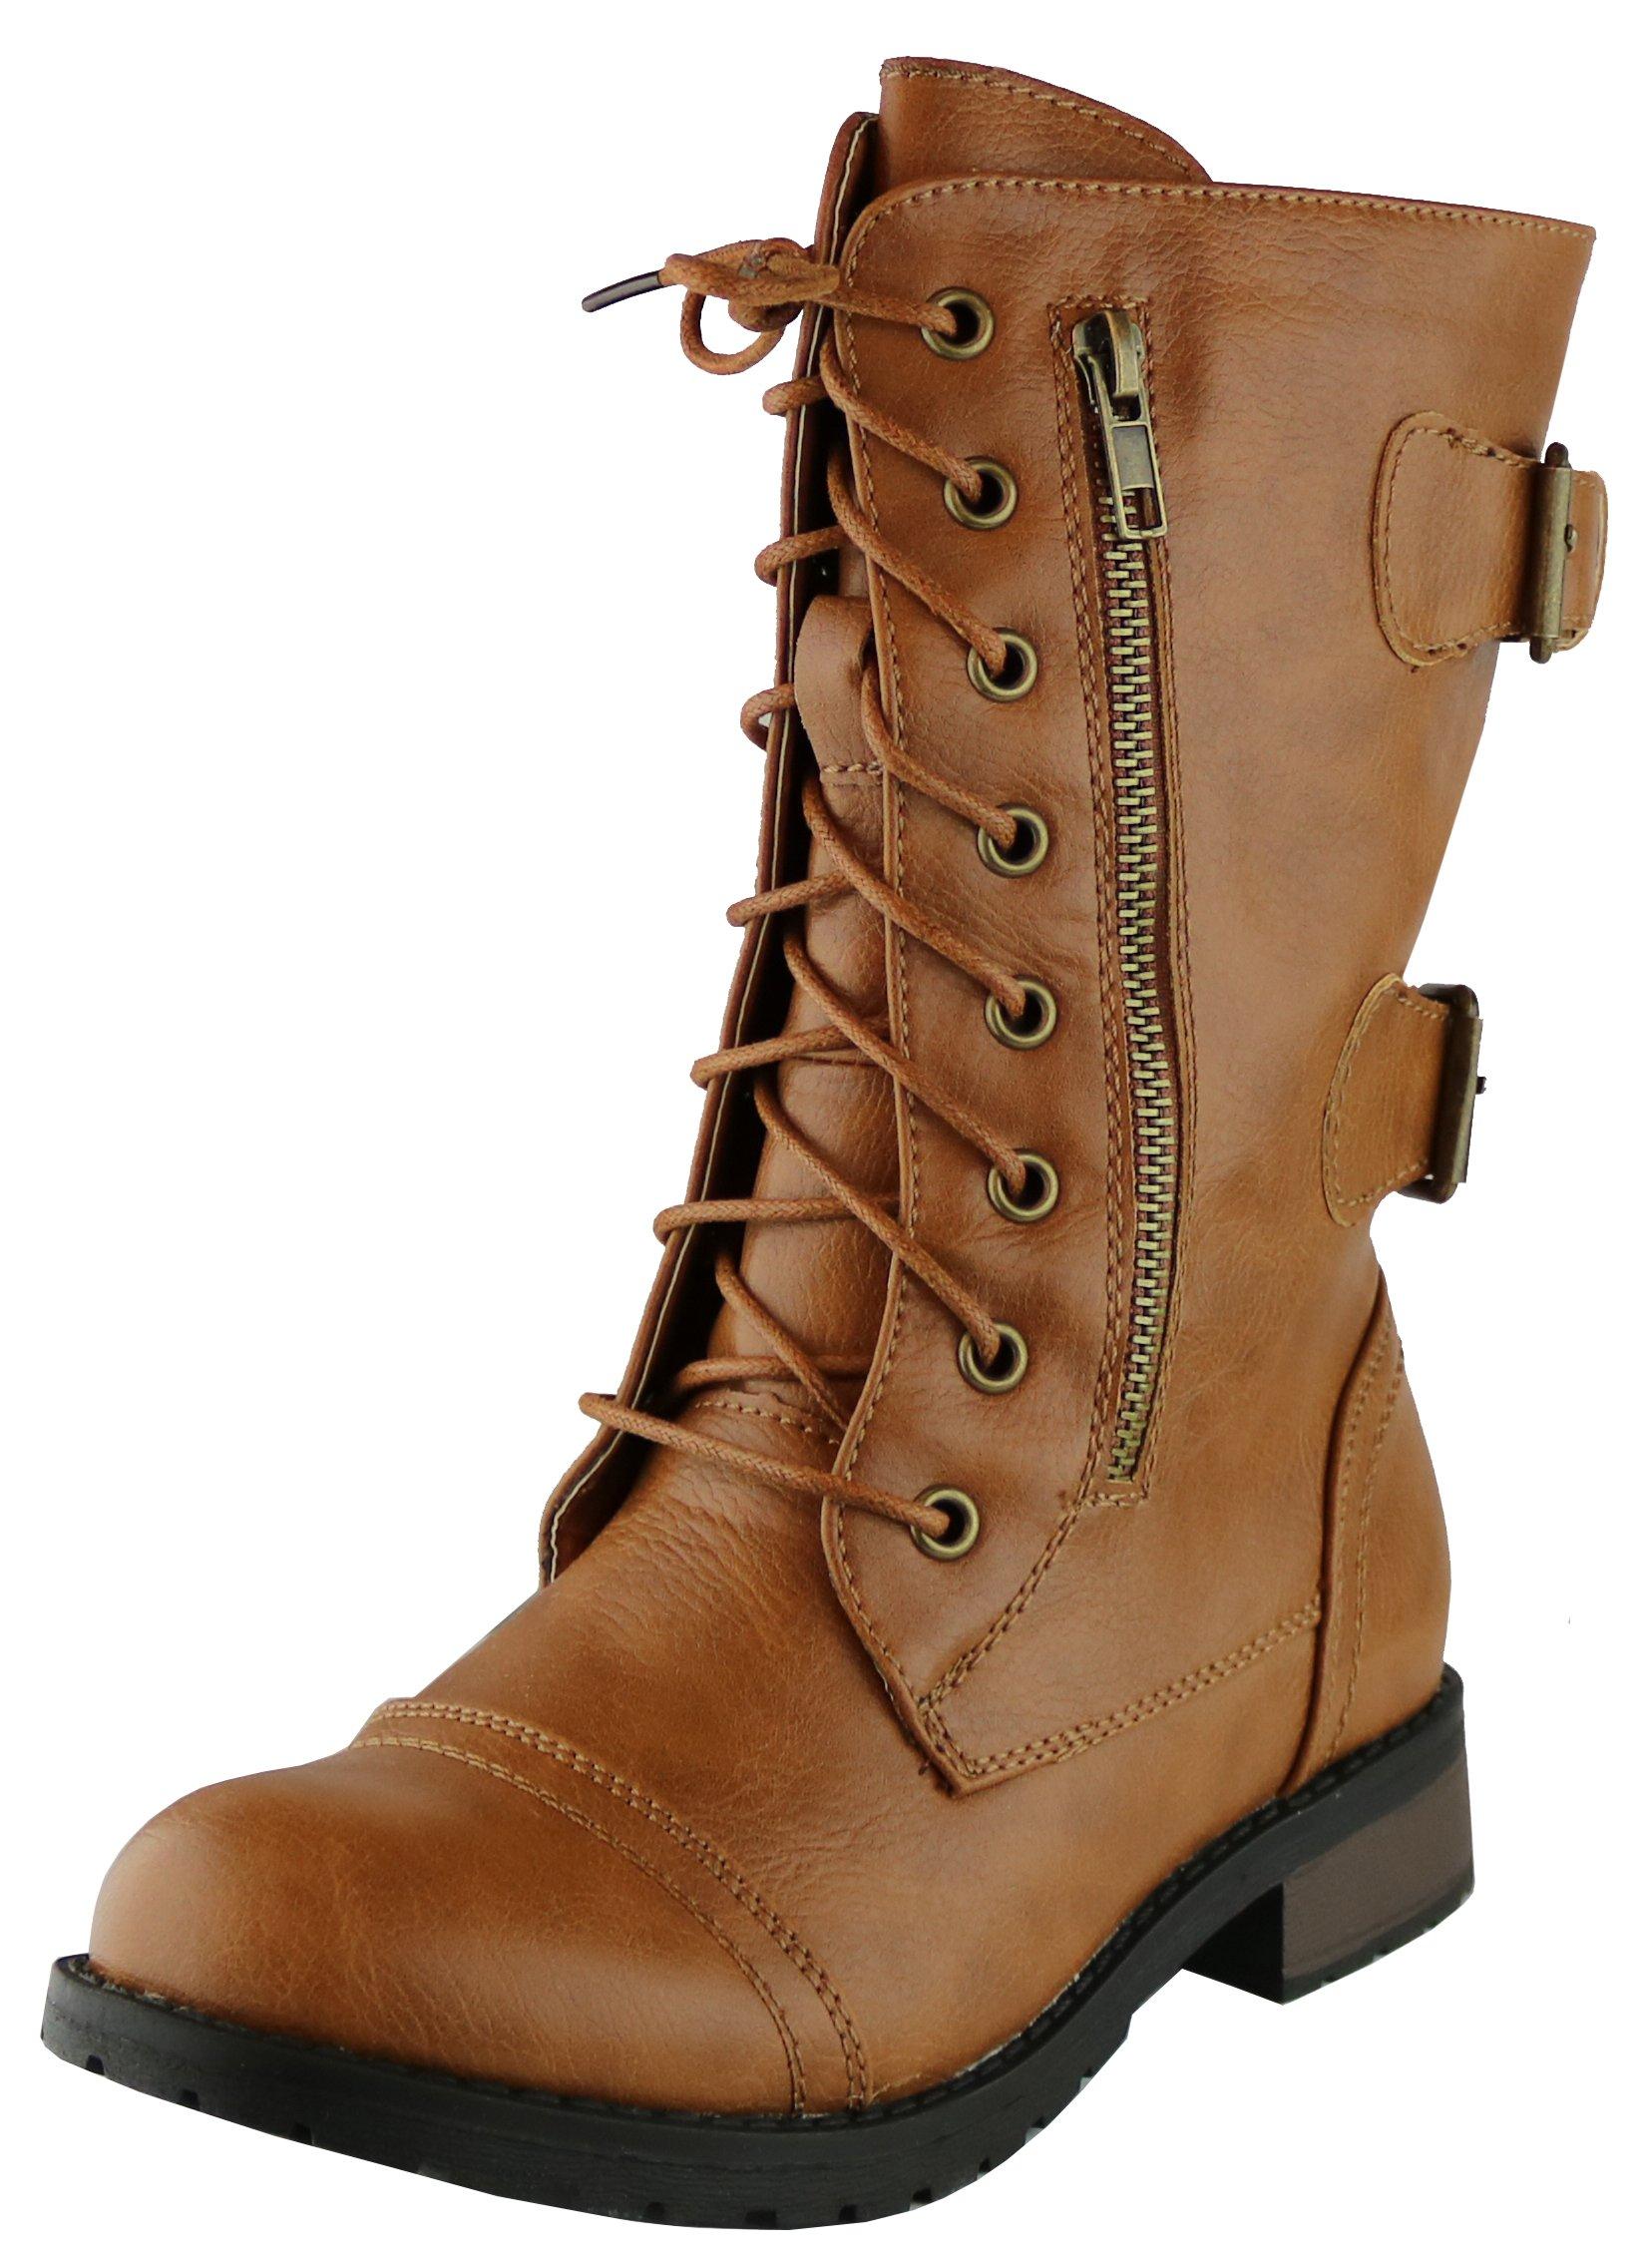 Cambridge Select Women's Combat Military Zipper Buckle Mid-Calf Boot (7.5 B(M) US, Camel)